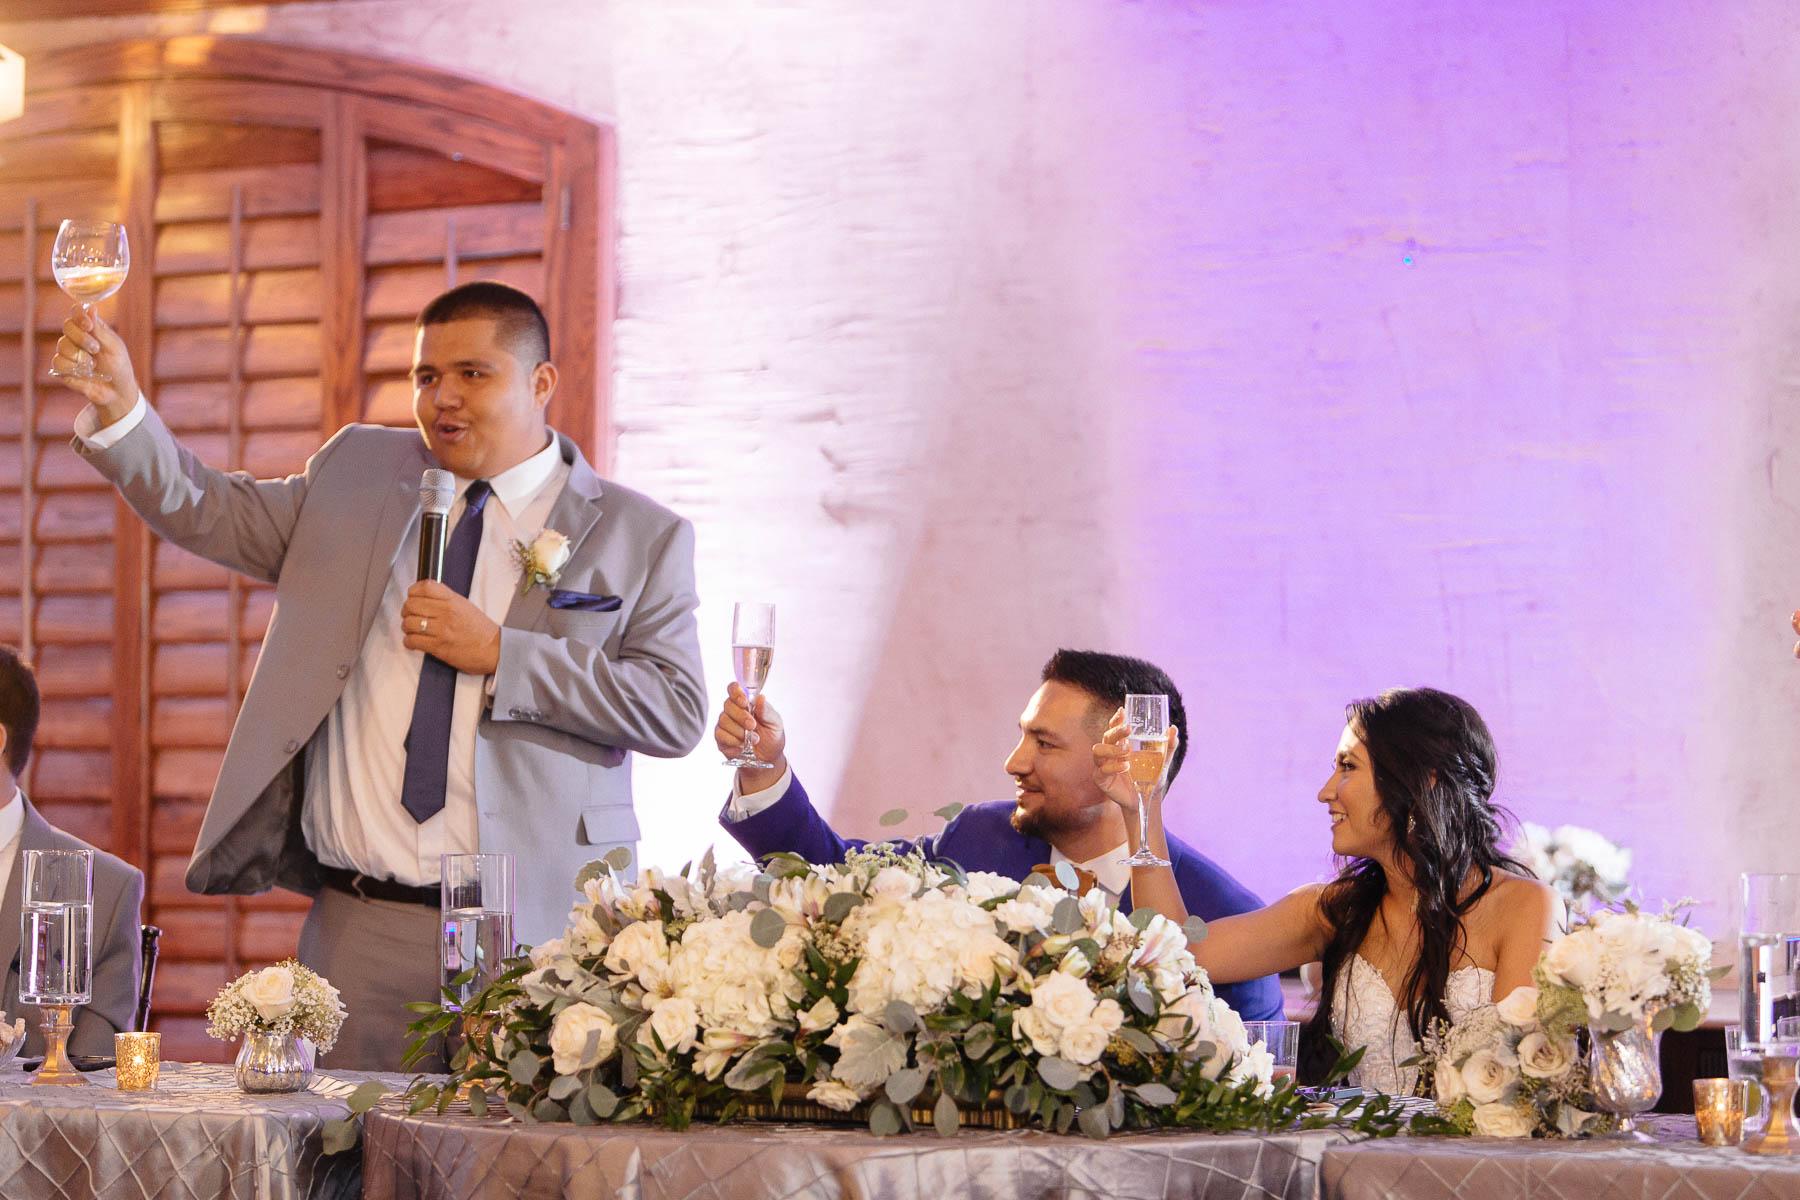 161029-Luxium-Weddings-Arizona-Jeff-Griselda-First-Look-Val-Vista-Lakes-Gilber-077.jpg